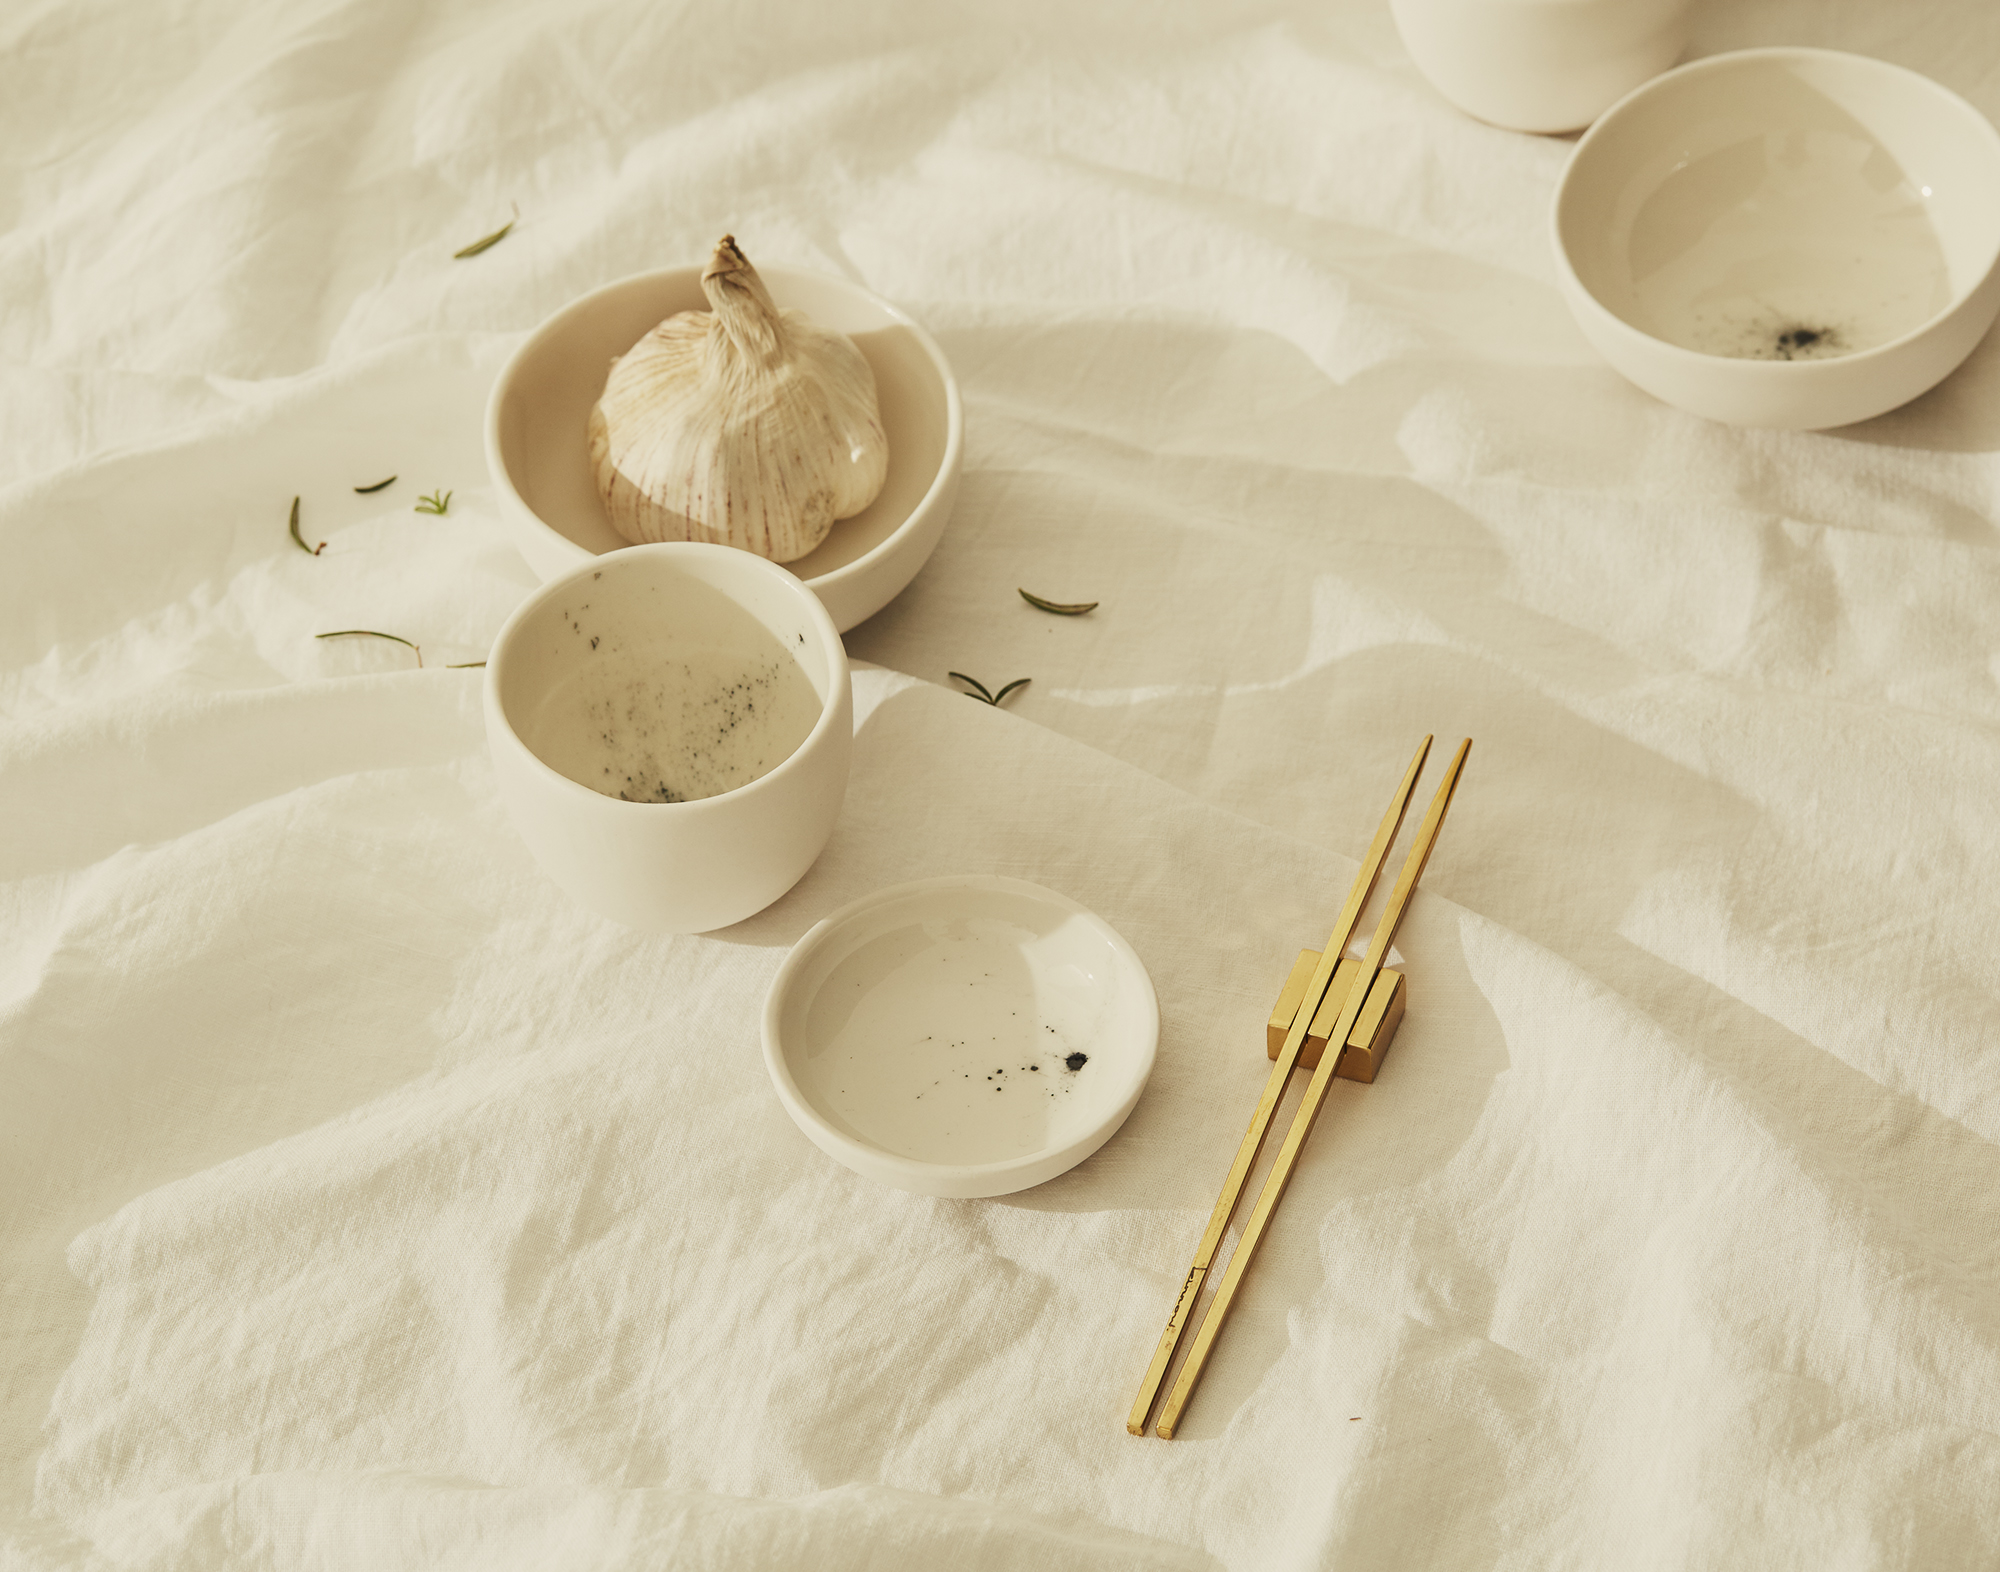 Embellish 'Stardust' ceramics with 'Maibashi' brass chopsticks from Kinnow Cutlery.